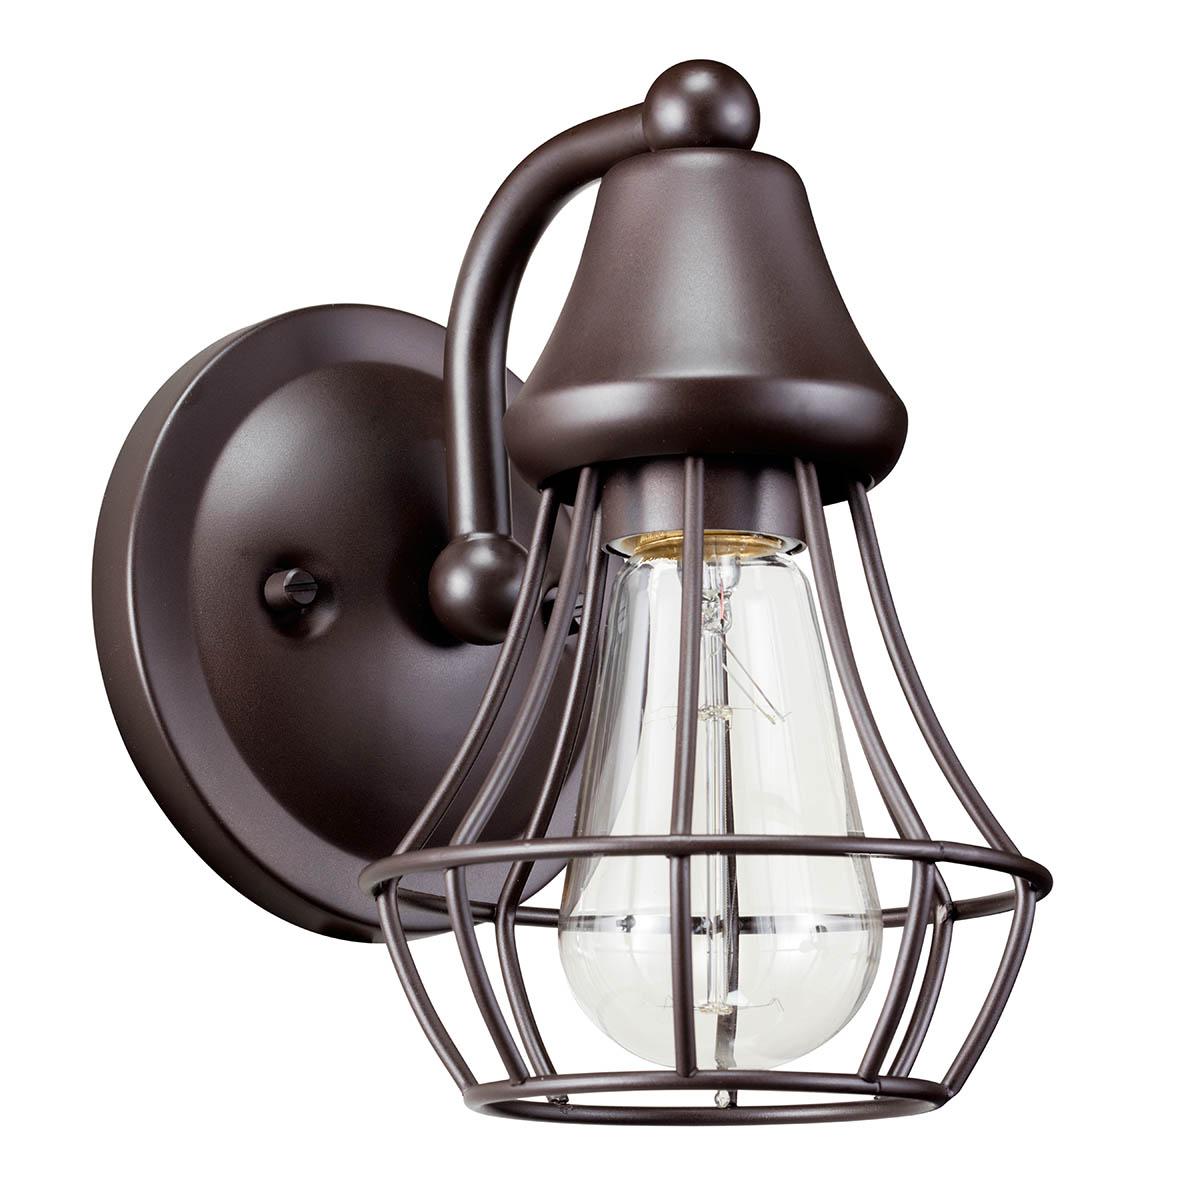 Bayley™ 1 Light Wall Sconce Olde Bronze® | Kichler Lighting on Kichler Olde Bronze Wall Sconce id=54147